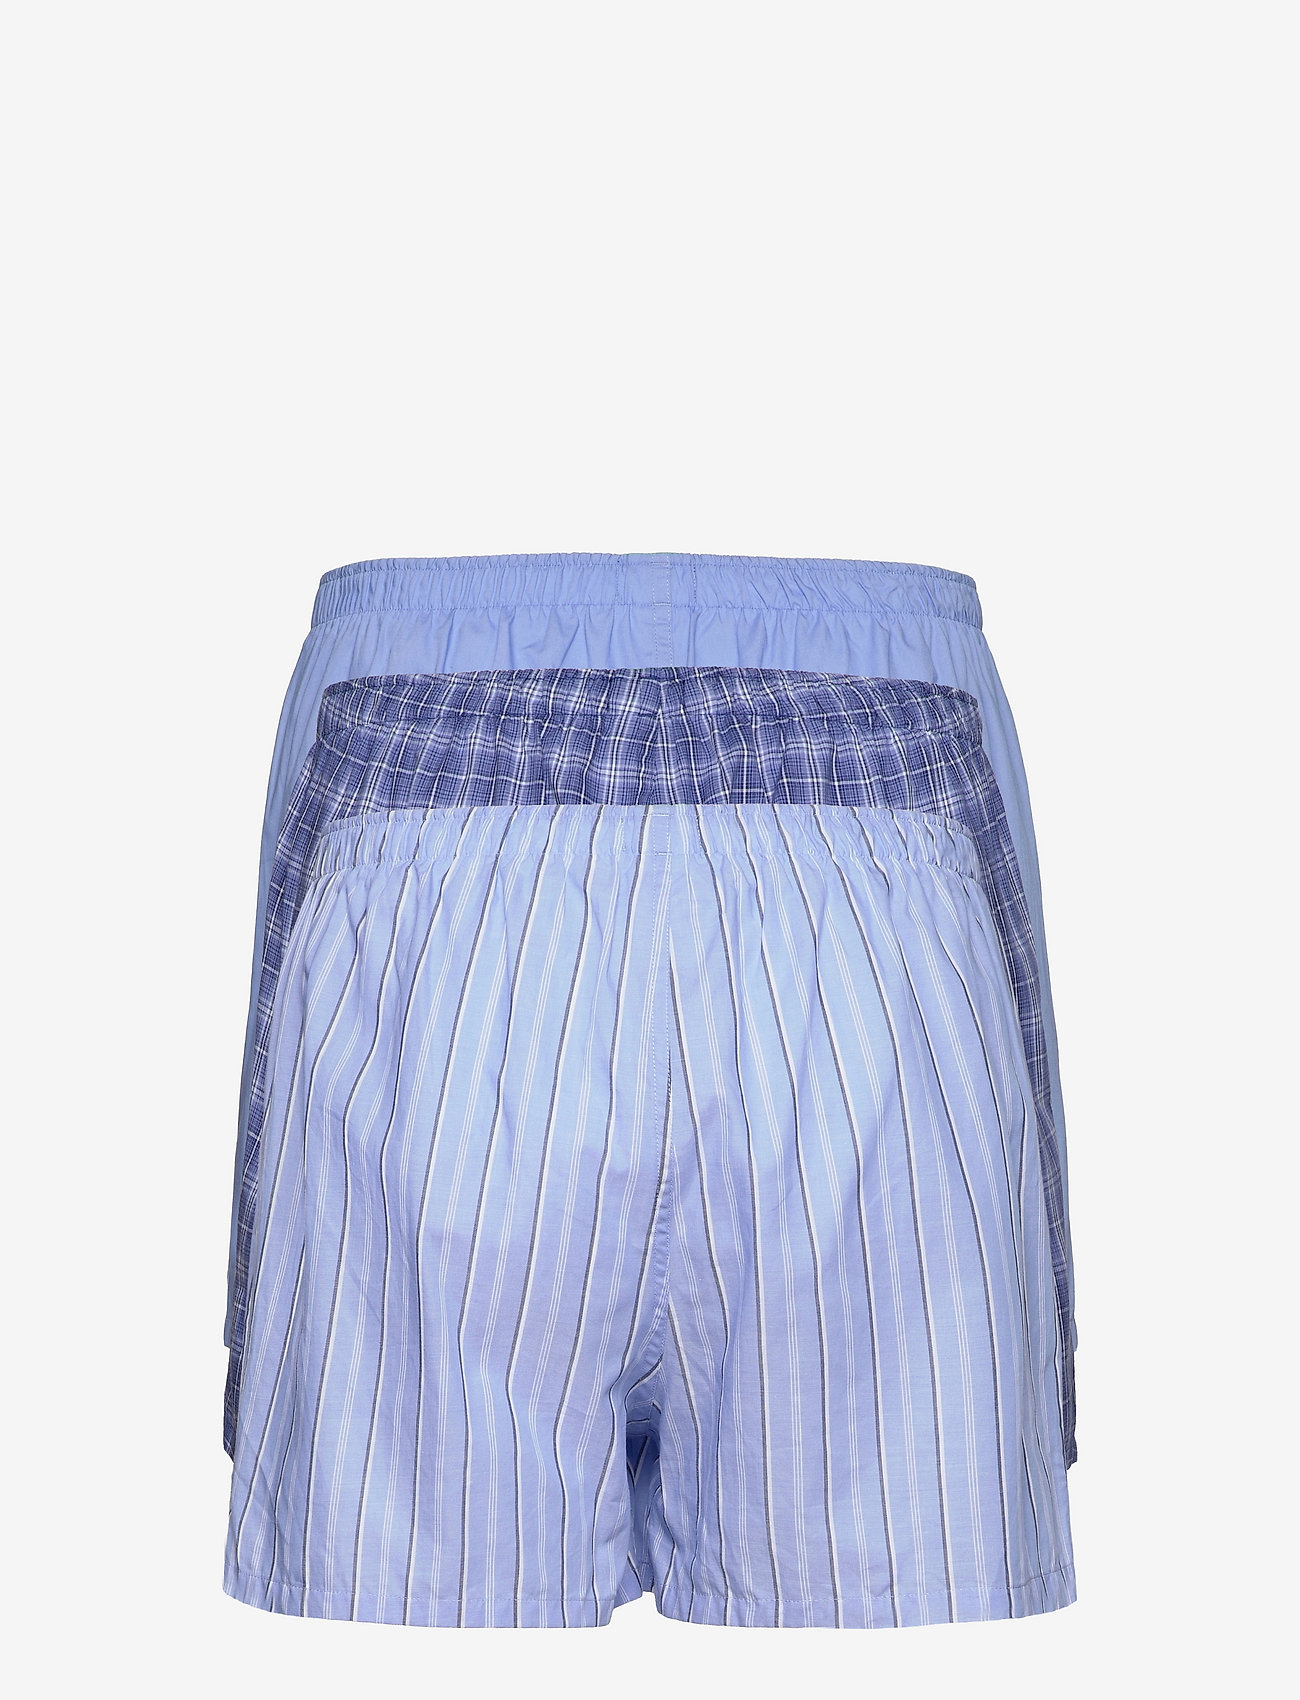 Polo Ralph Lauren Underwear - Cotton Boxer 3-Pack - boxer shorts - 3pk bsr blu/blue - 1